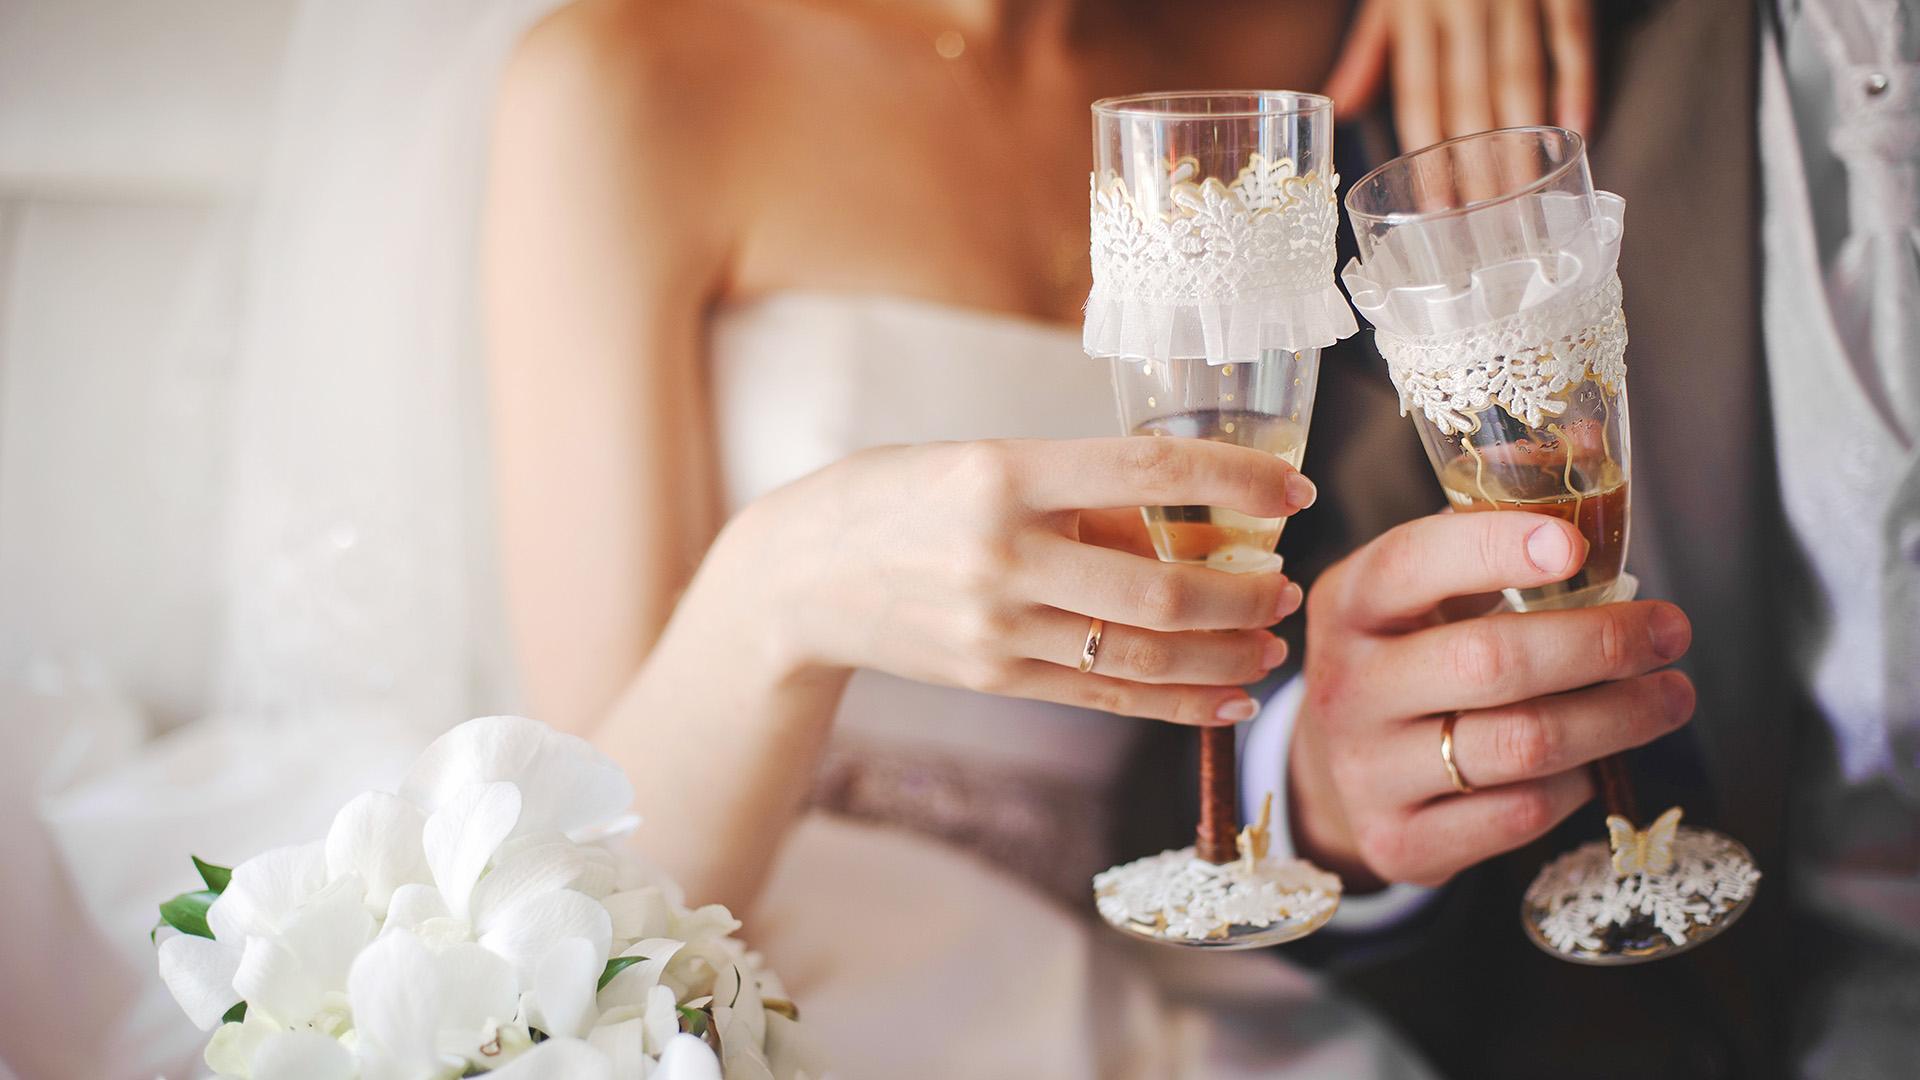 Wedding Venues in Hampshire Mercure Southampton Centre Dolphin Hotel Honeymoon Suite 1